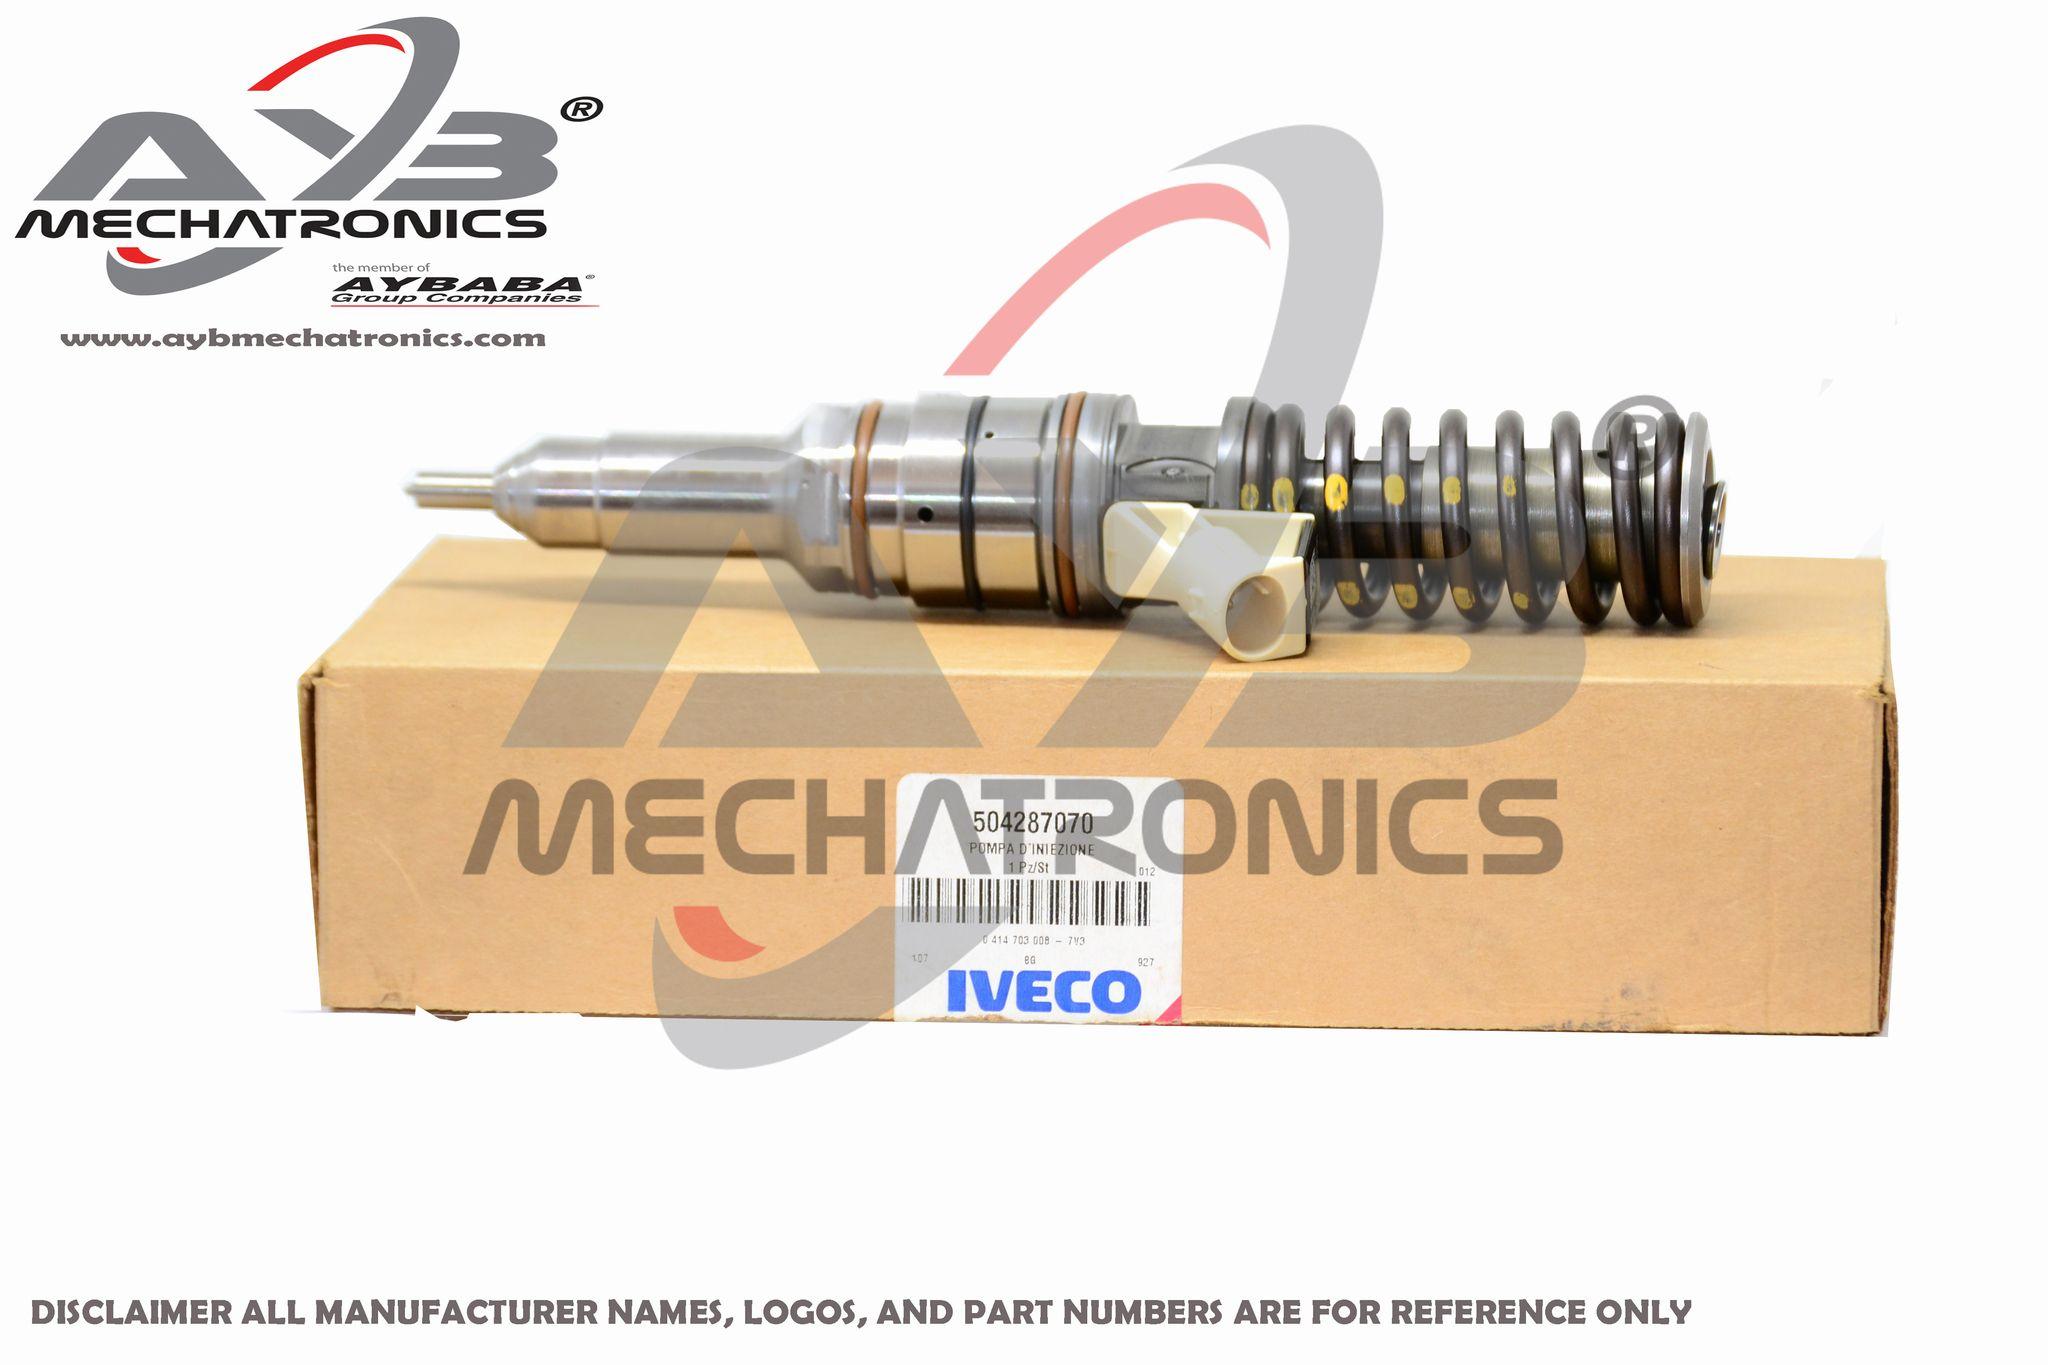 0414703008 504287070 504080487 504125329 iveco diesel fuel injector